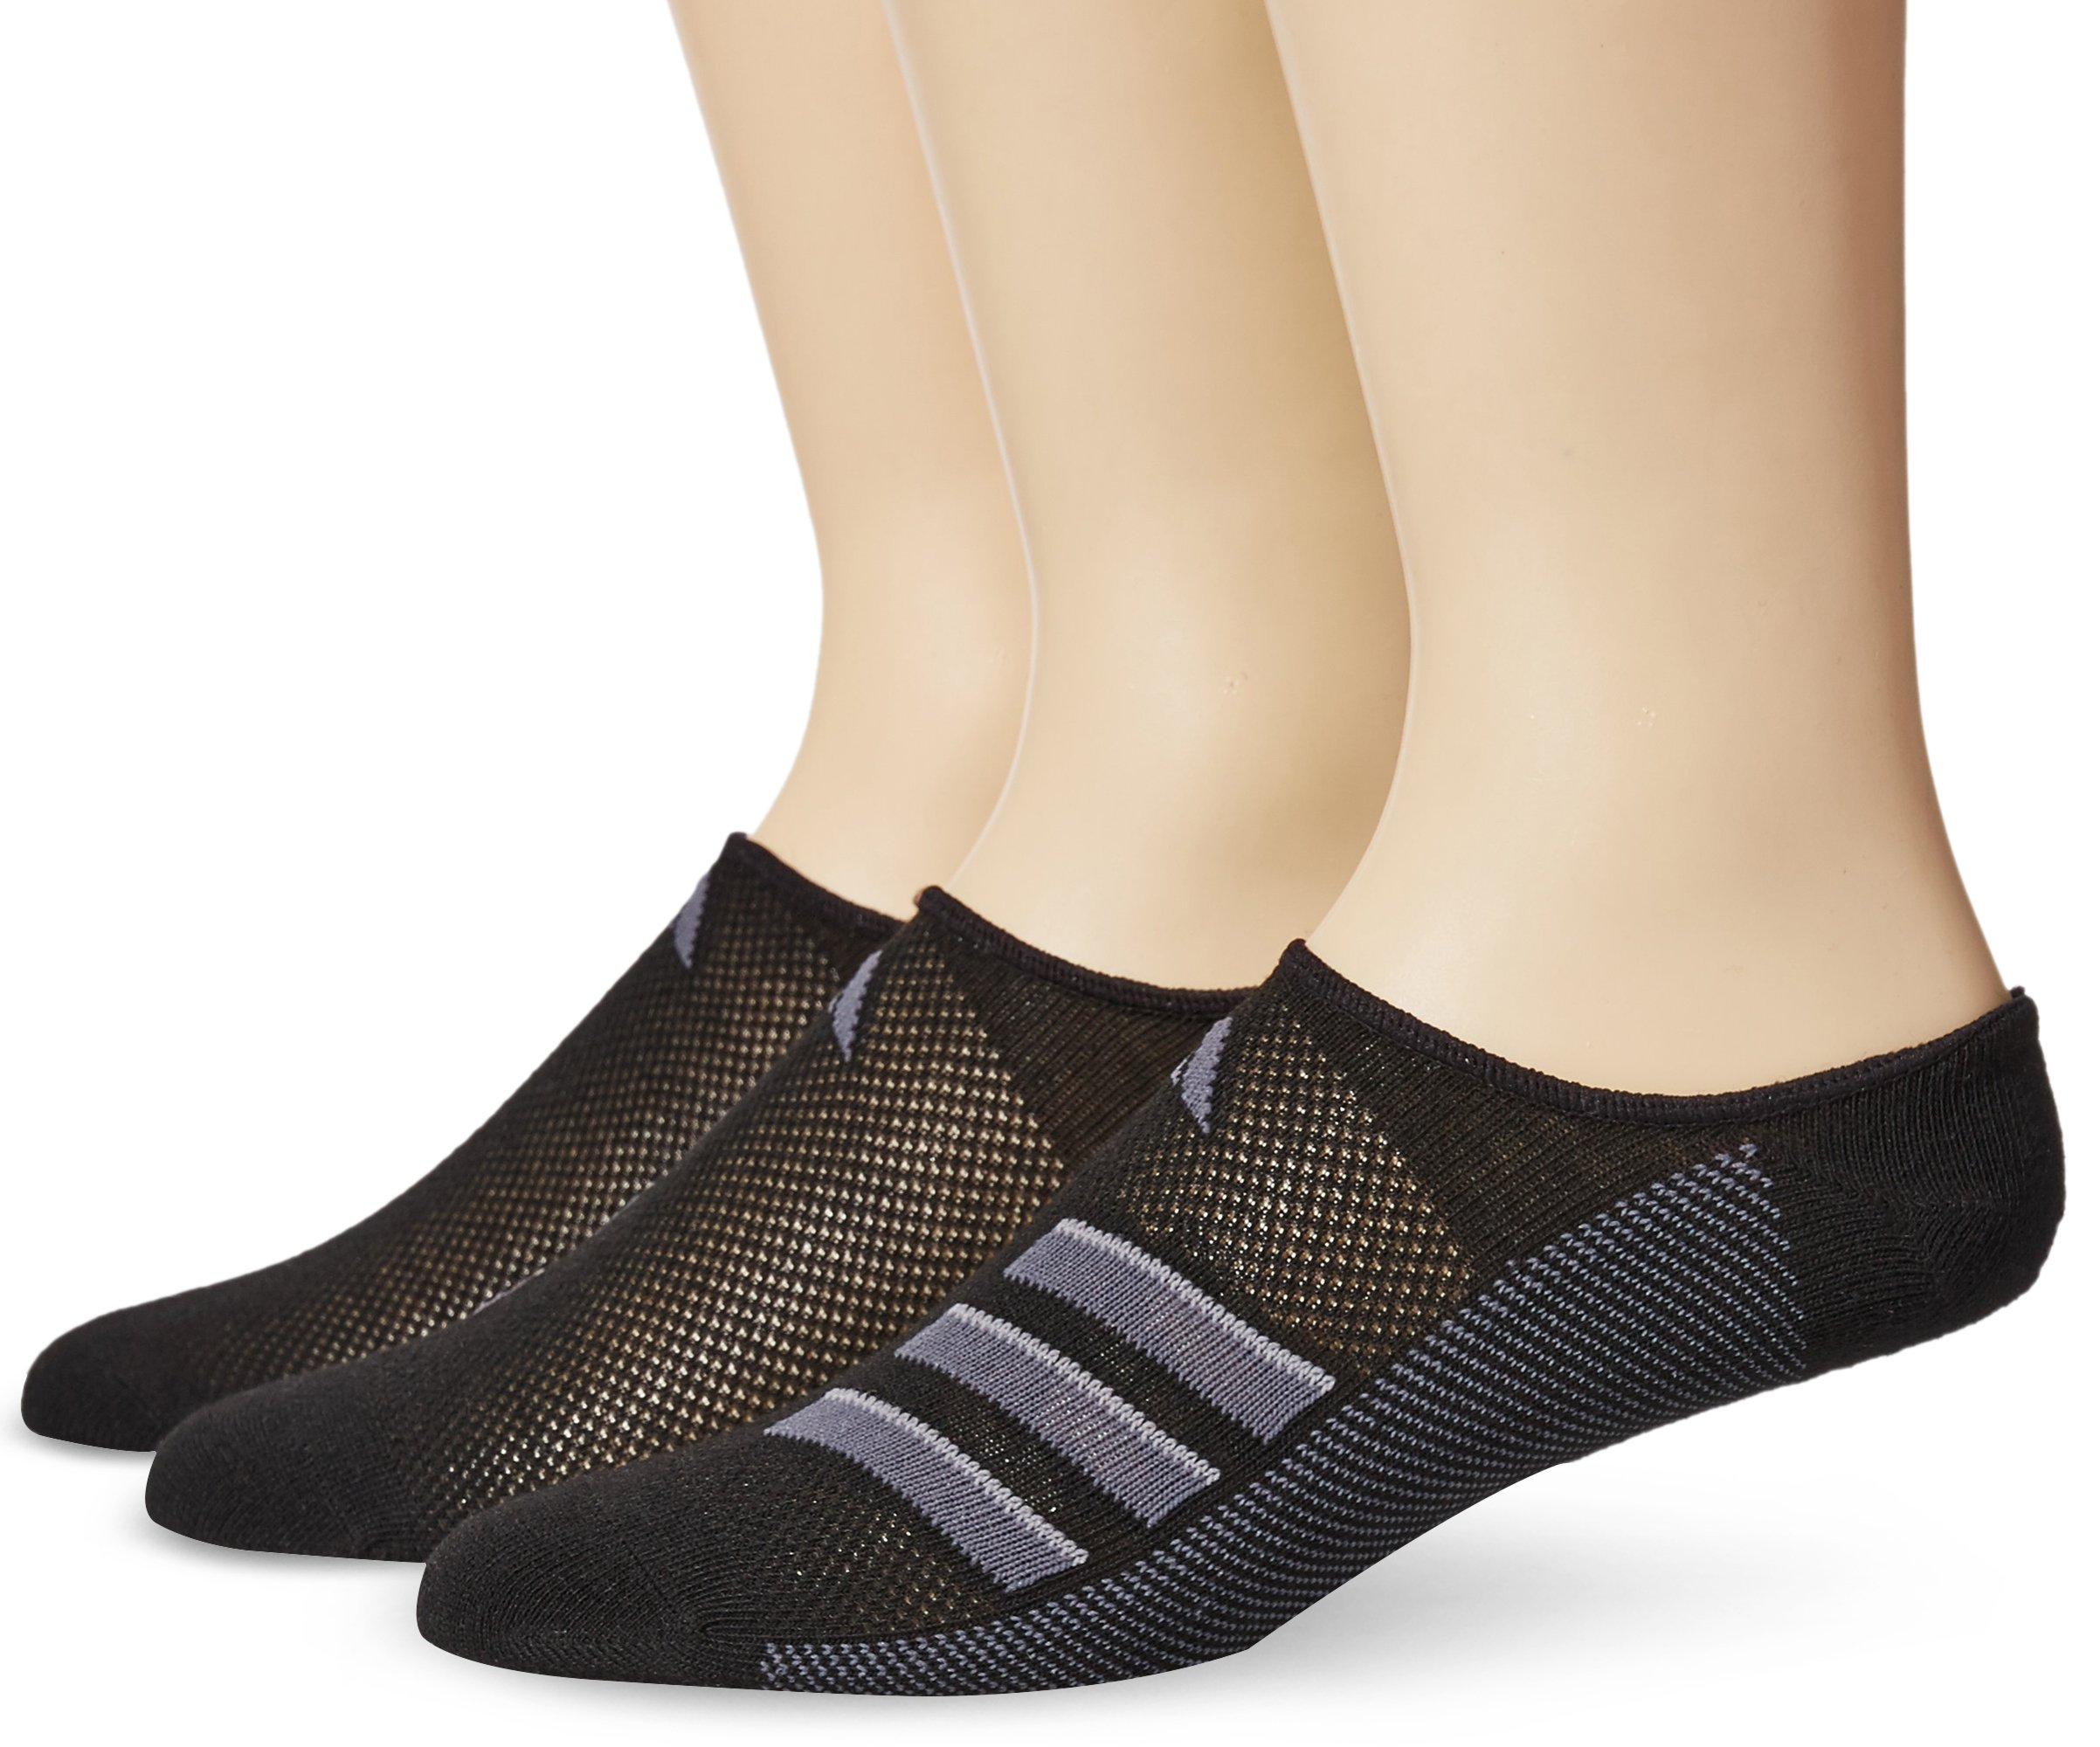 adidas Men's Climacool Superlite Super No Show Socks (3-Pack), Black/Onix/Light Onix, Size 6-12